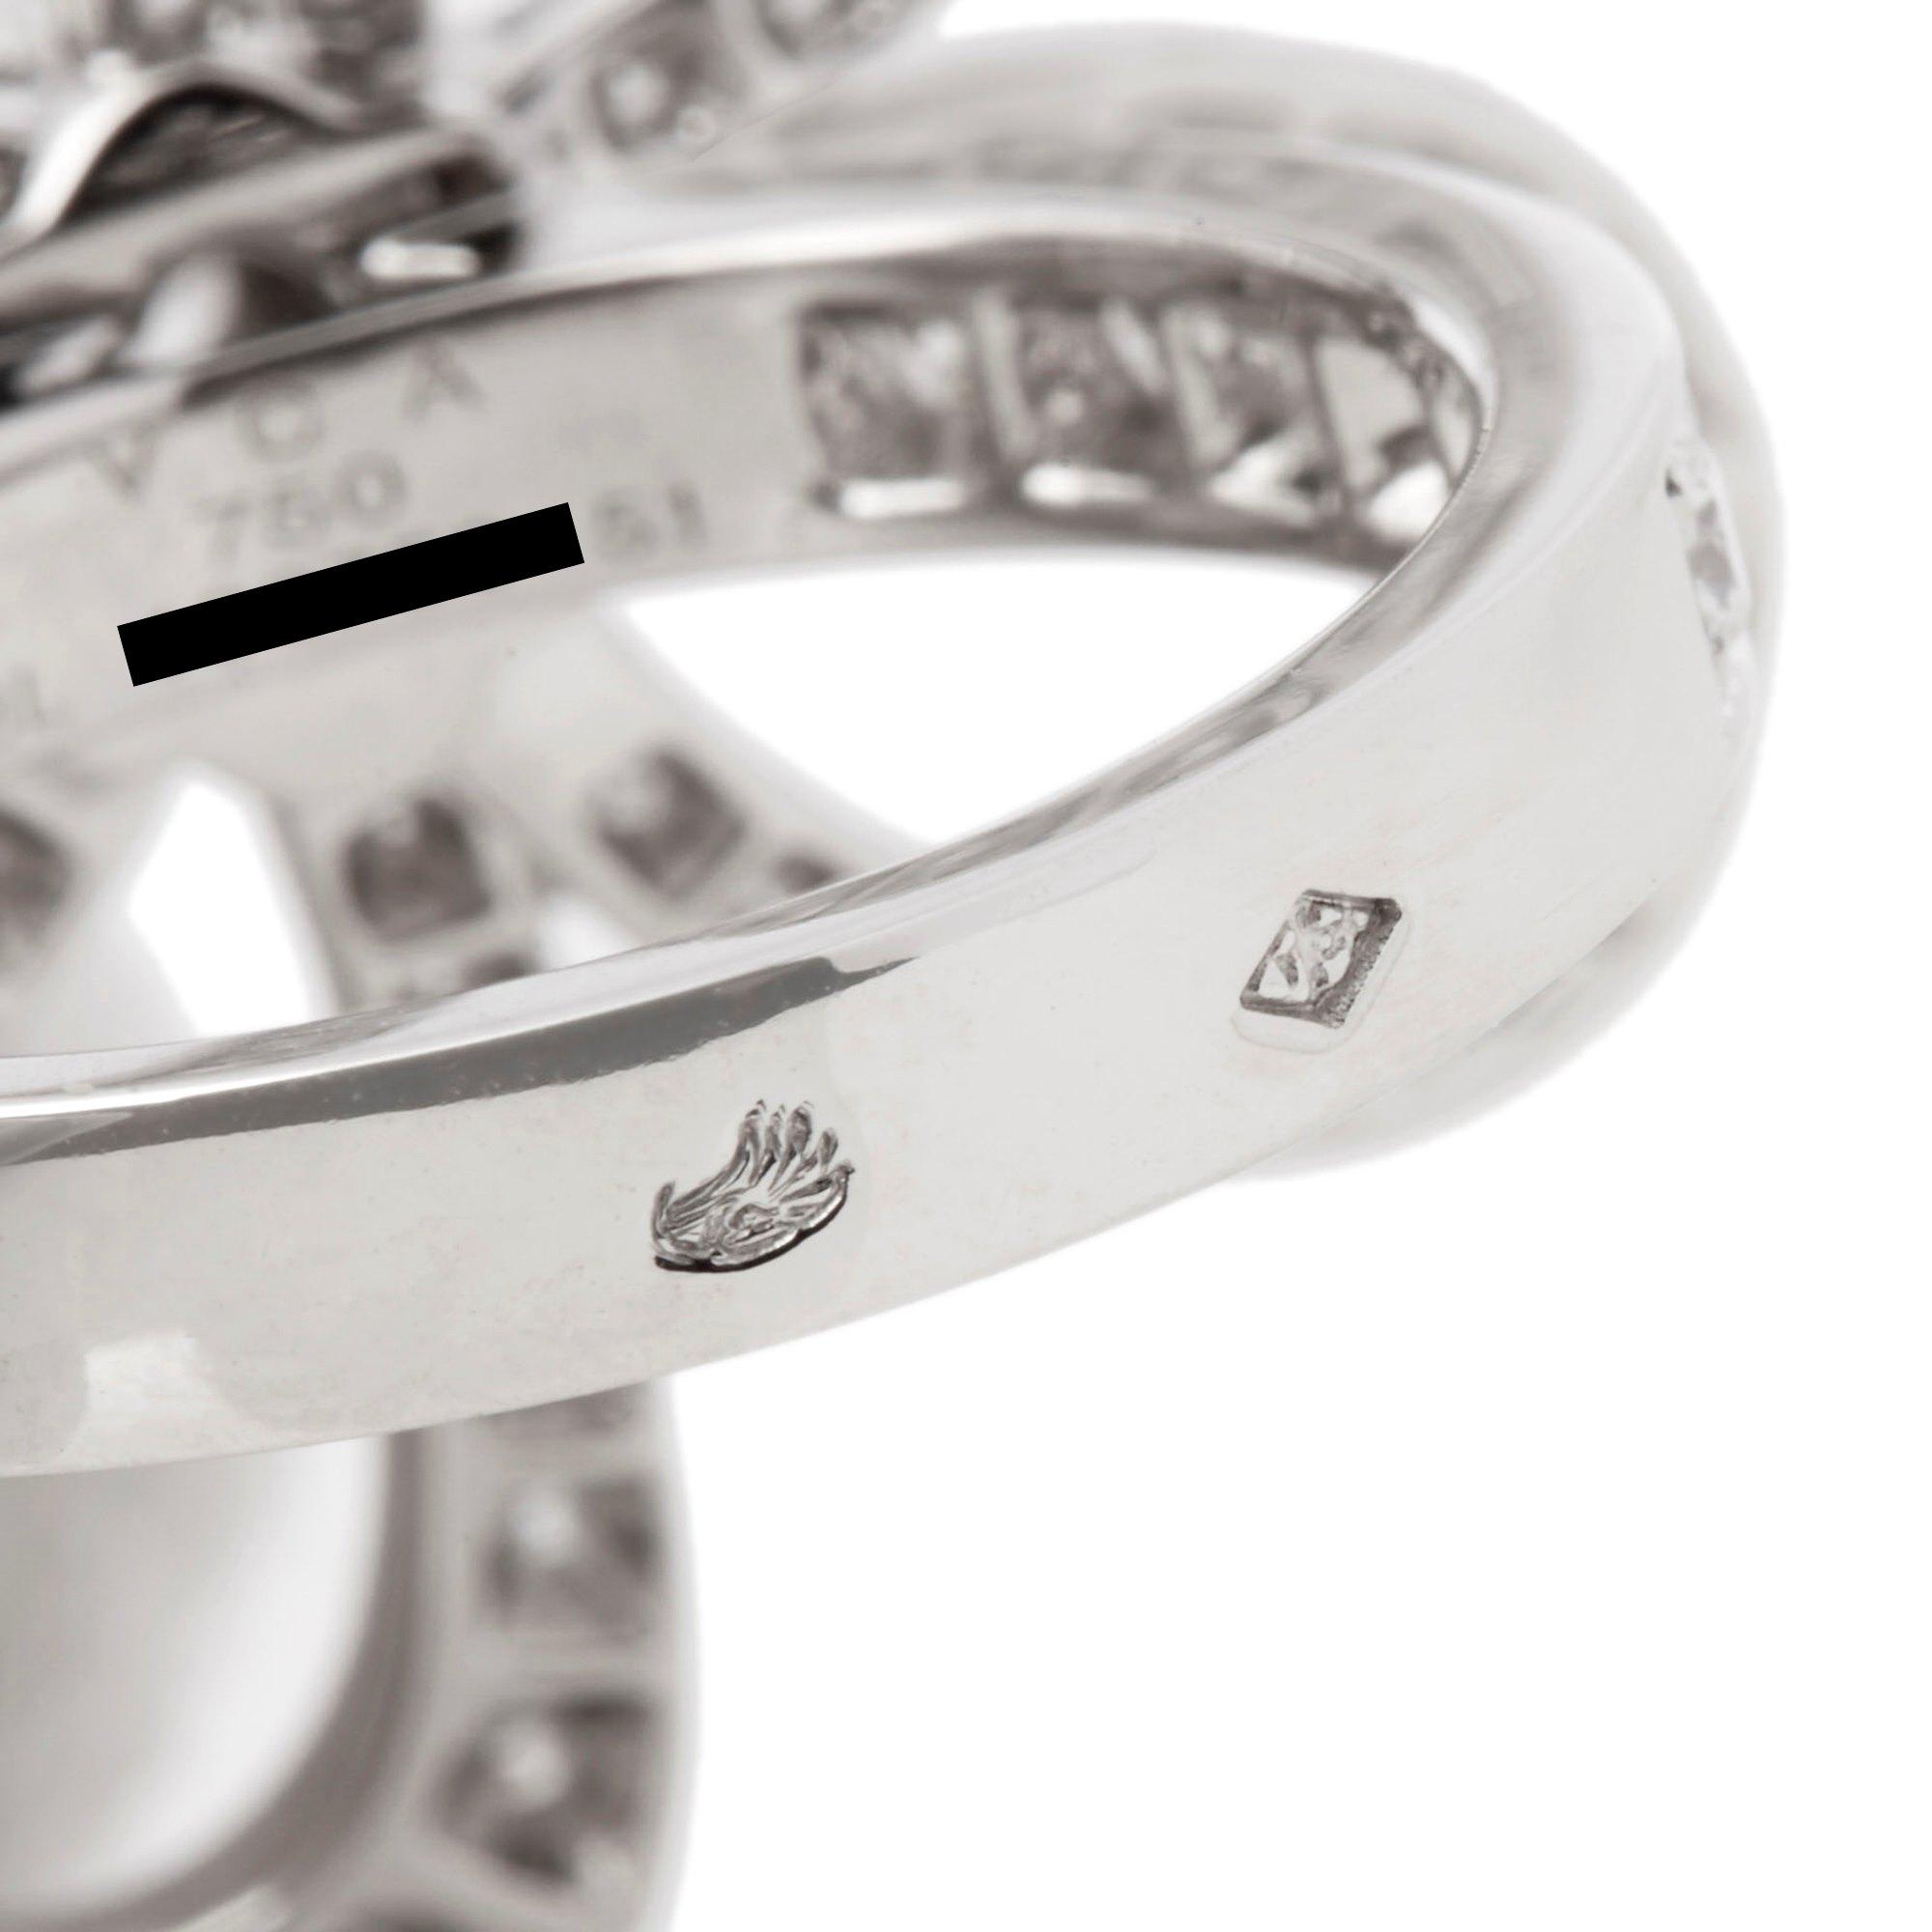 Van Cleef & Arpels 18k White Gold Diamond Flowerlace Ring